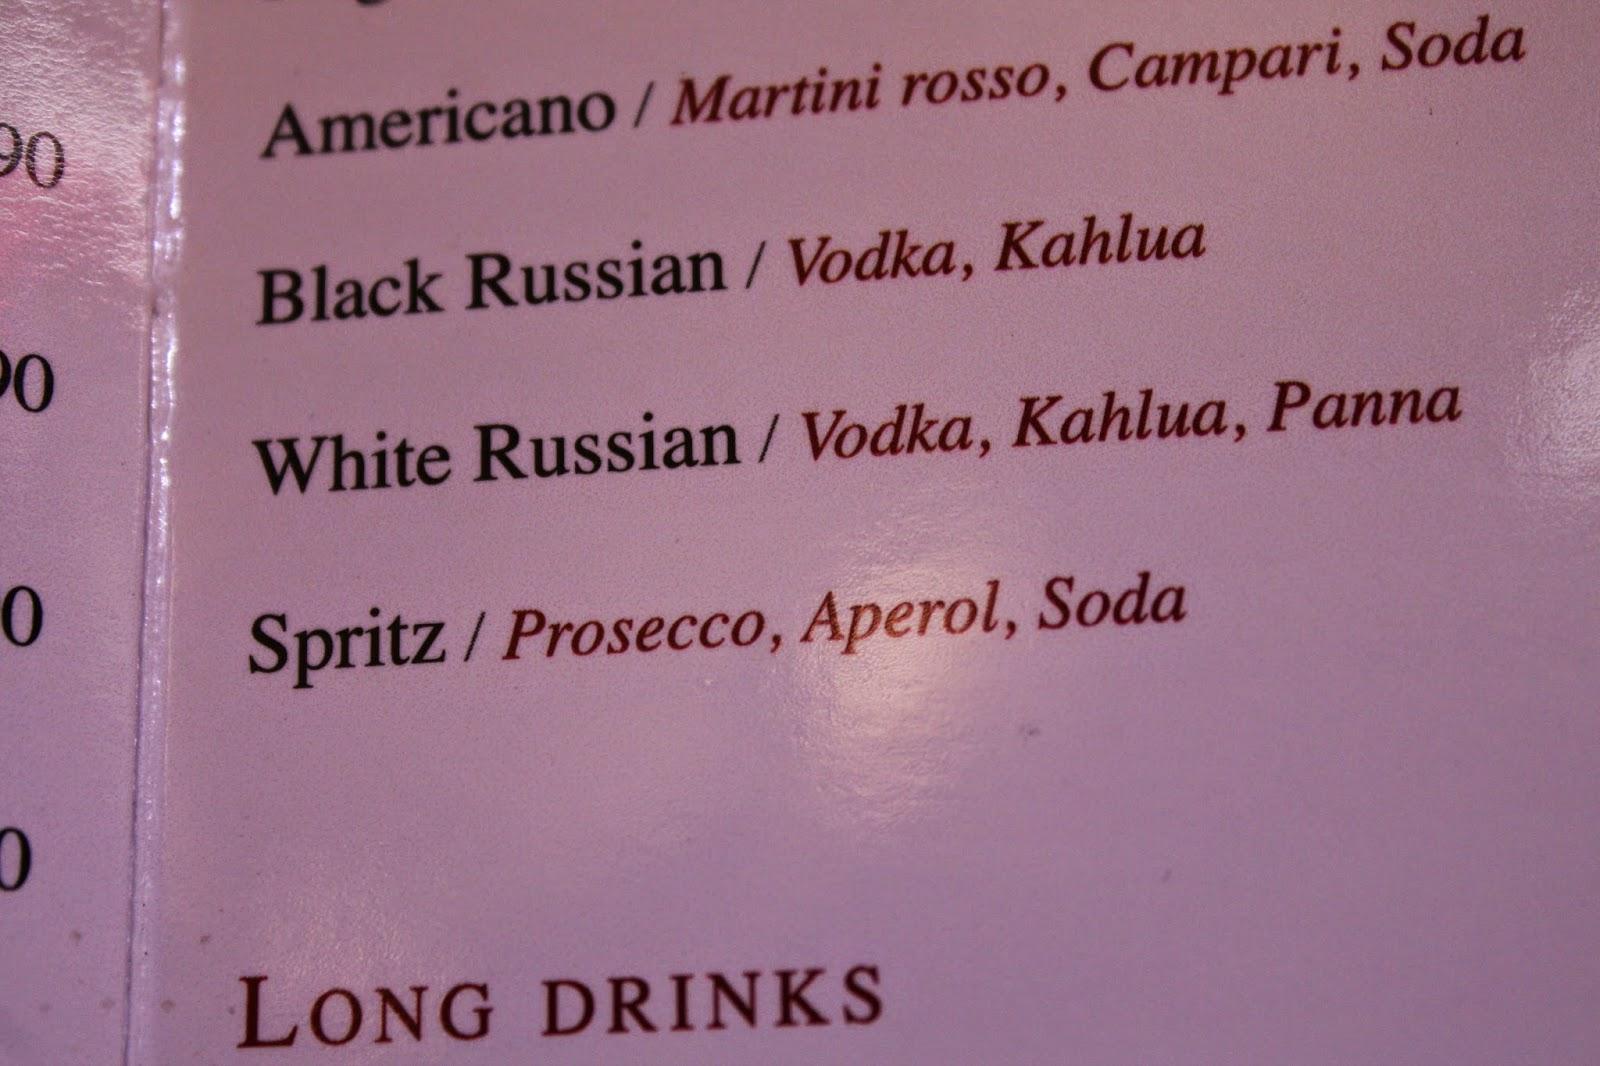 Italian menu listing for Spritz